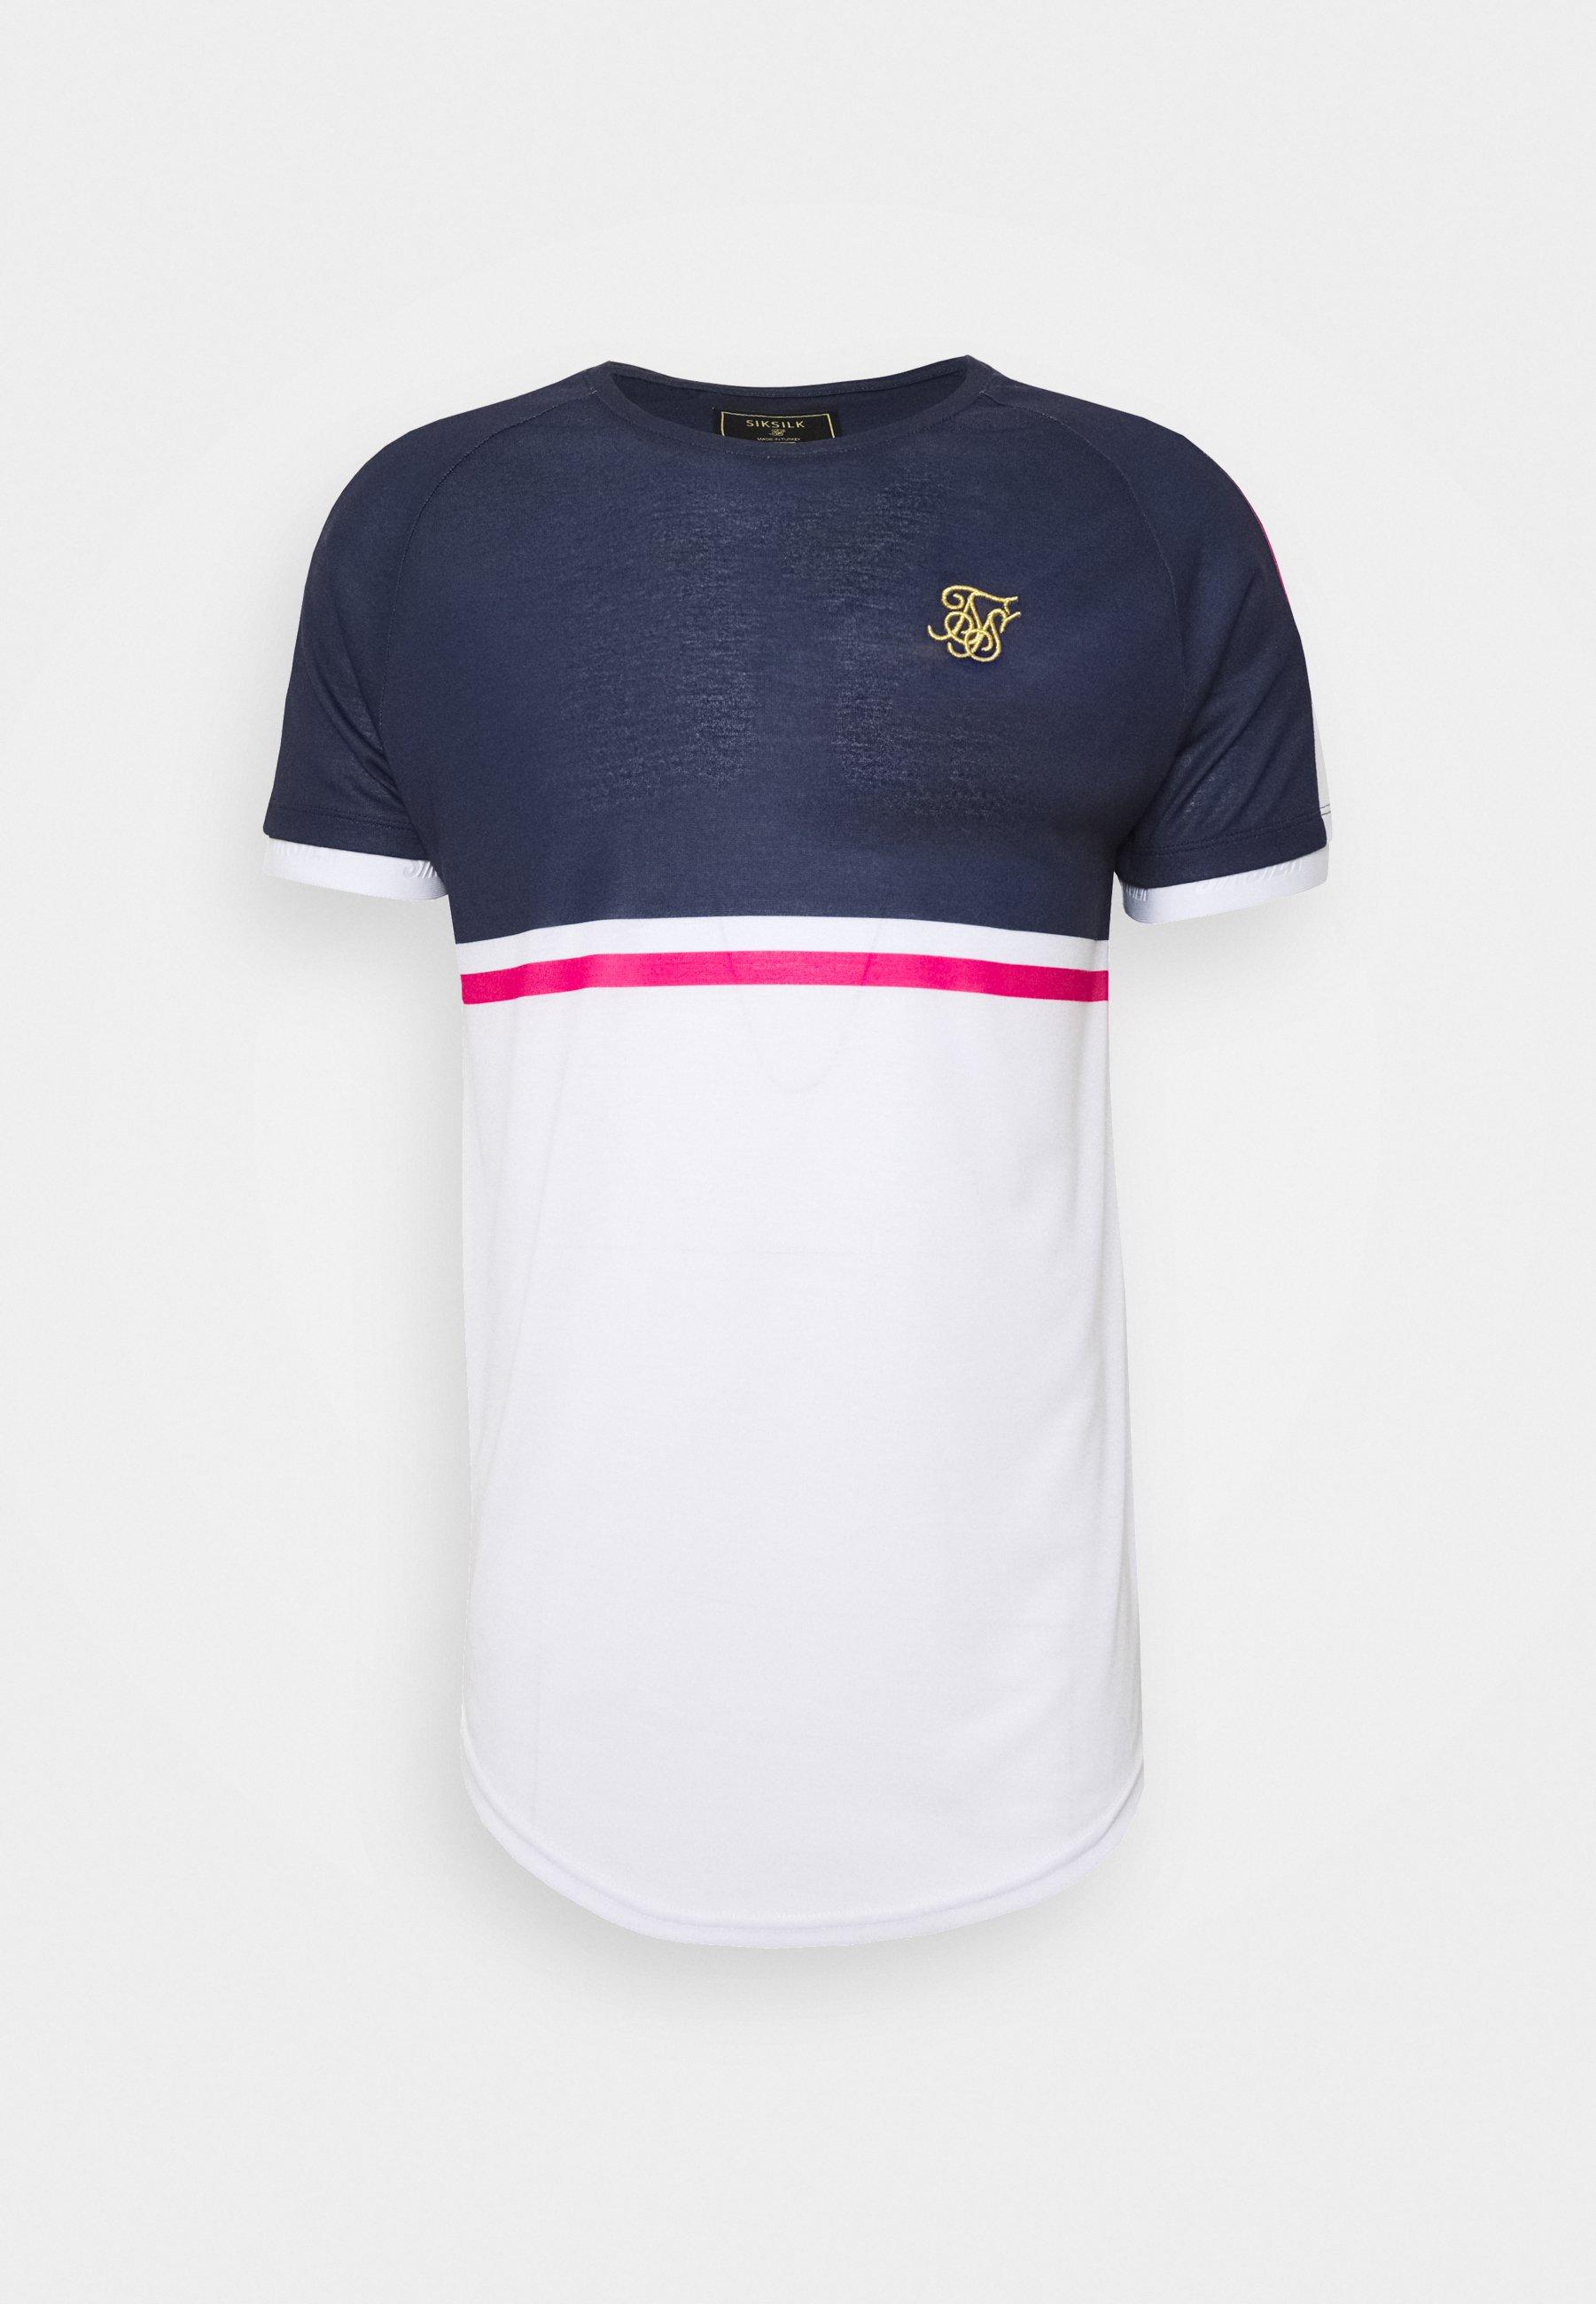 FADE PANEL RETRO STRIPE TEE T shirt print greypinkwhite